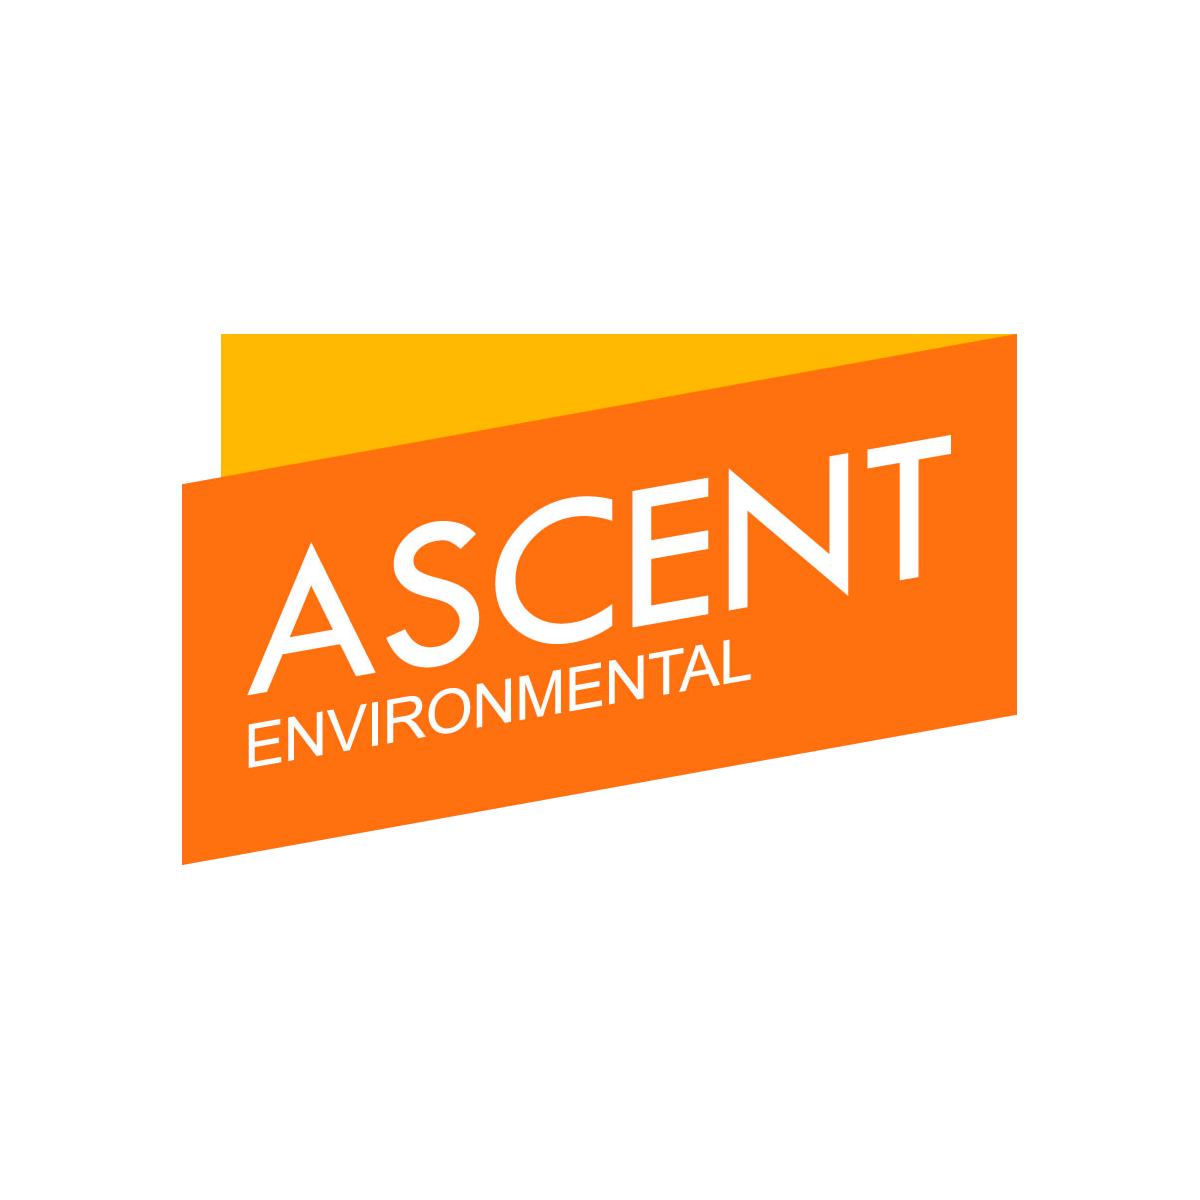 ascent-square.png